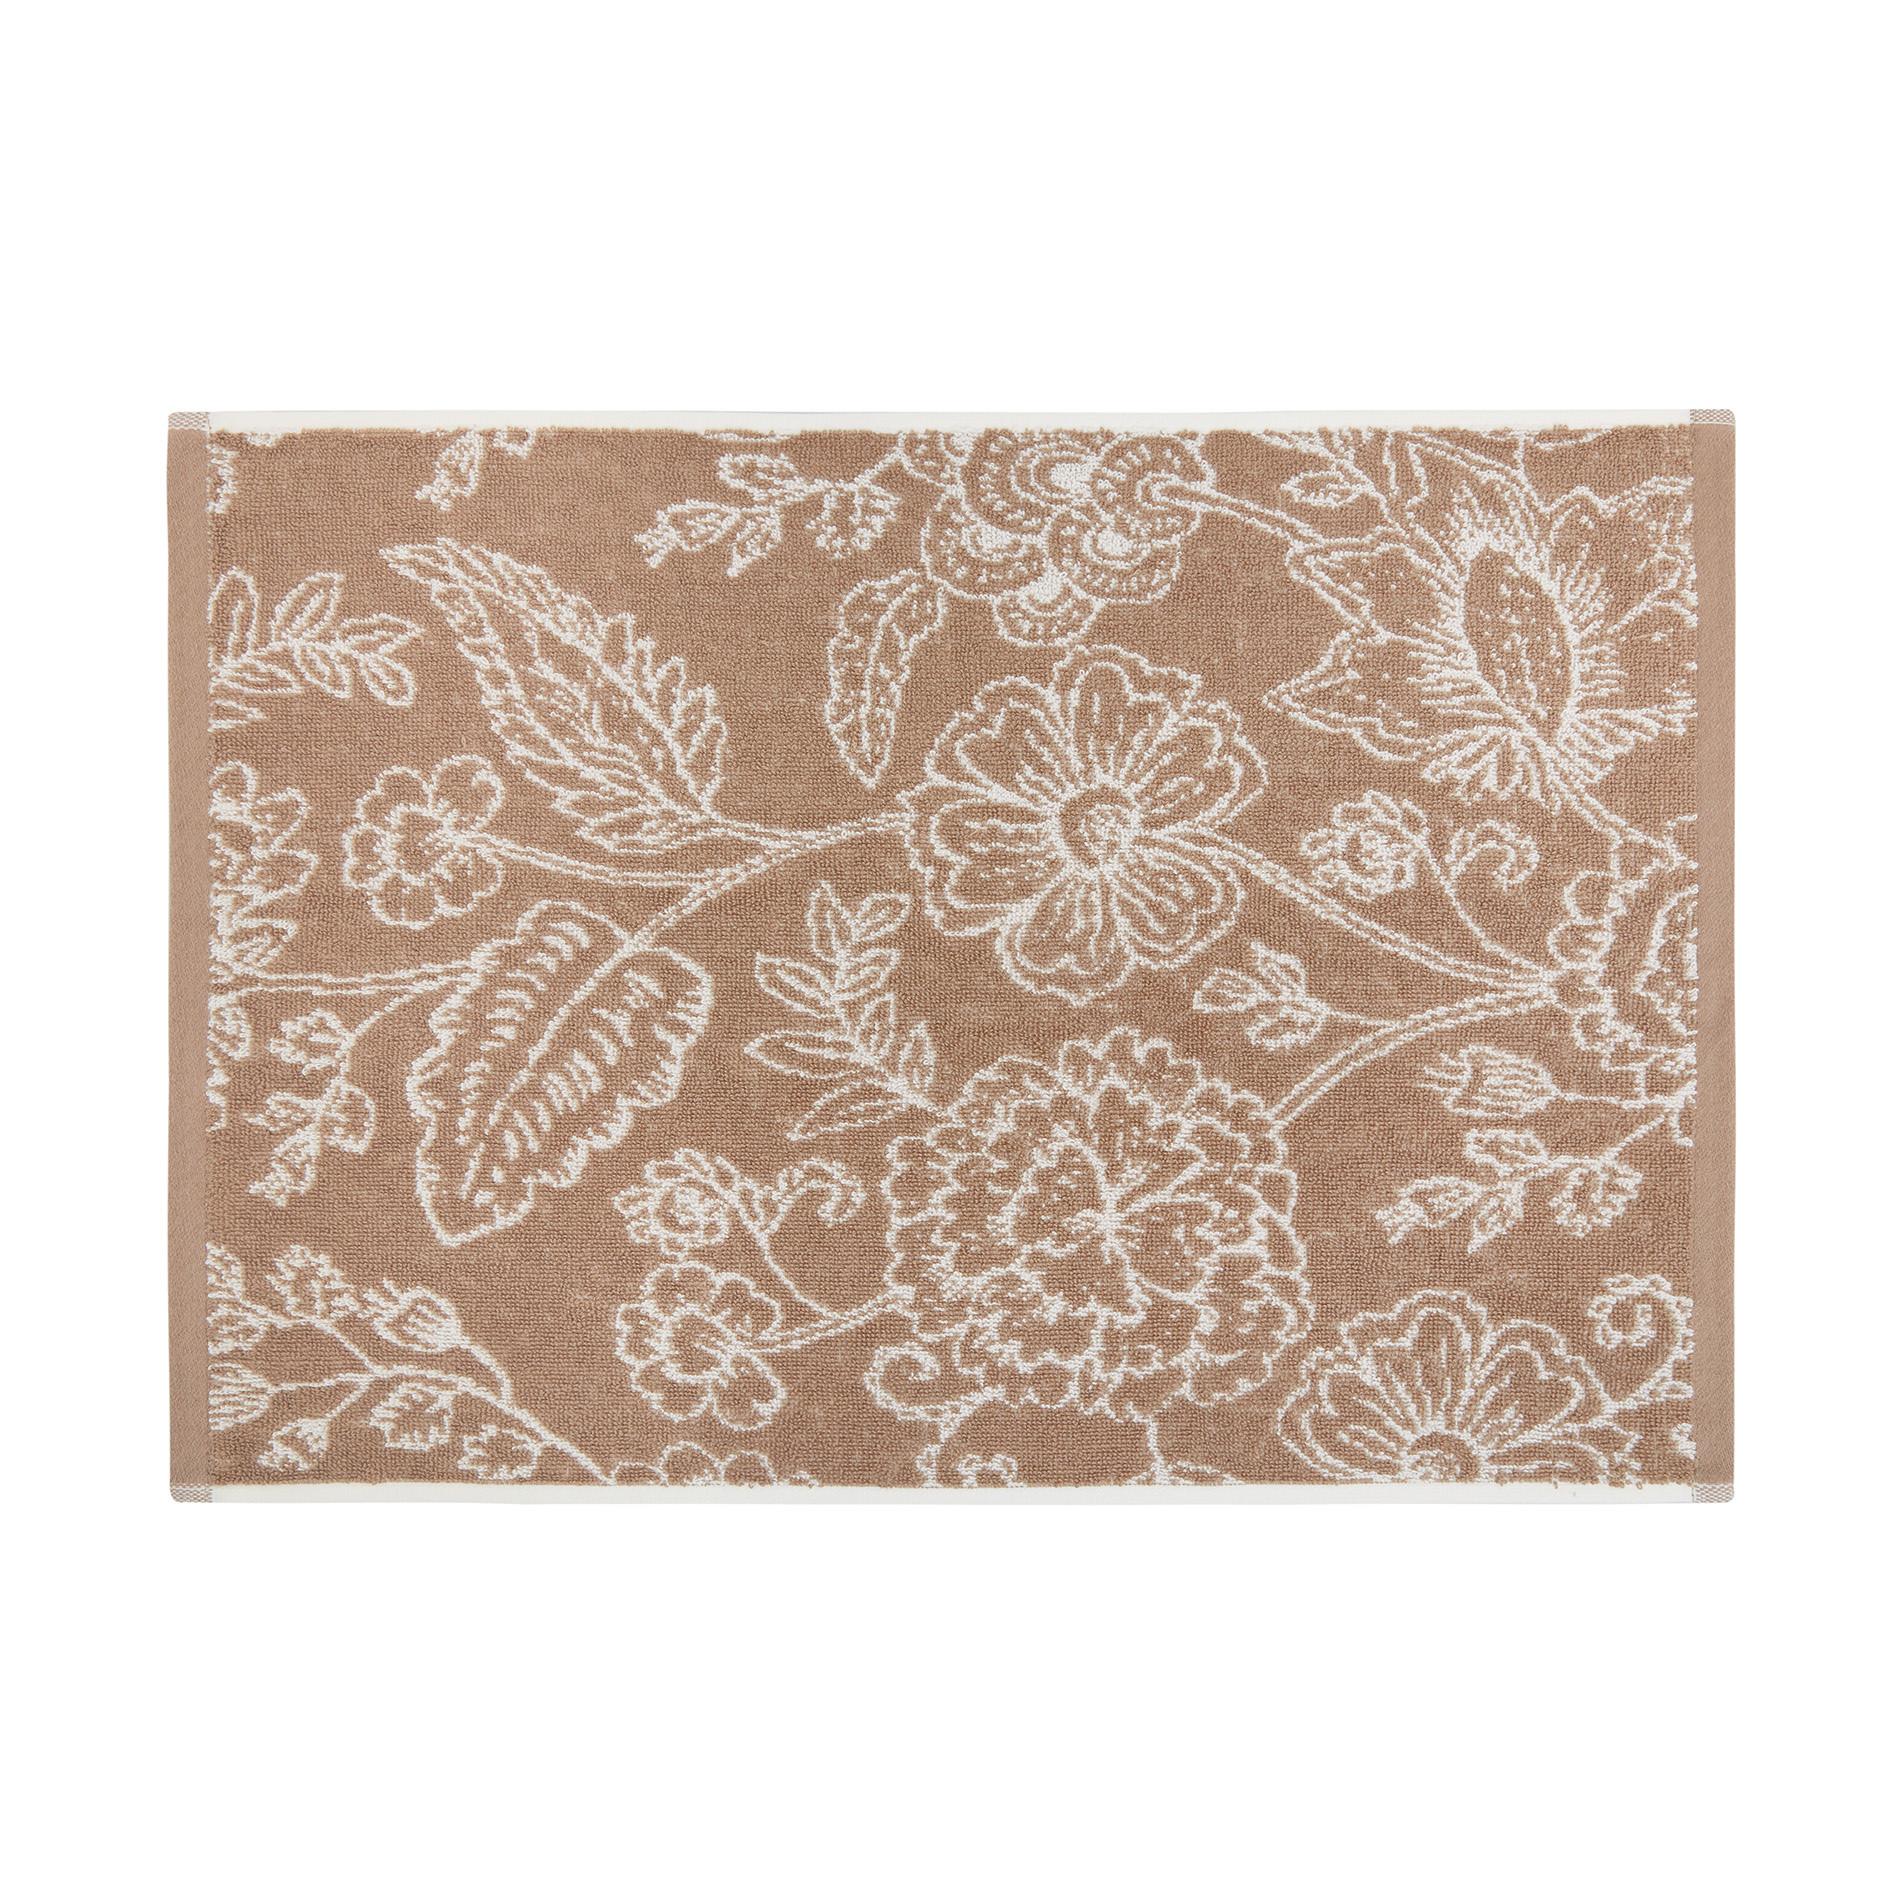 Asciugamano spugna di cotone fantasia floreale, Beige, large image number 2